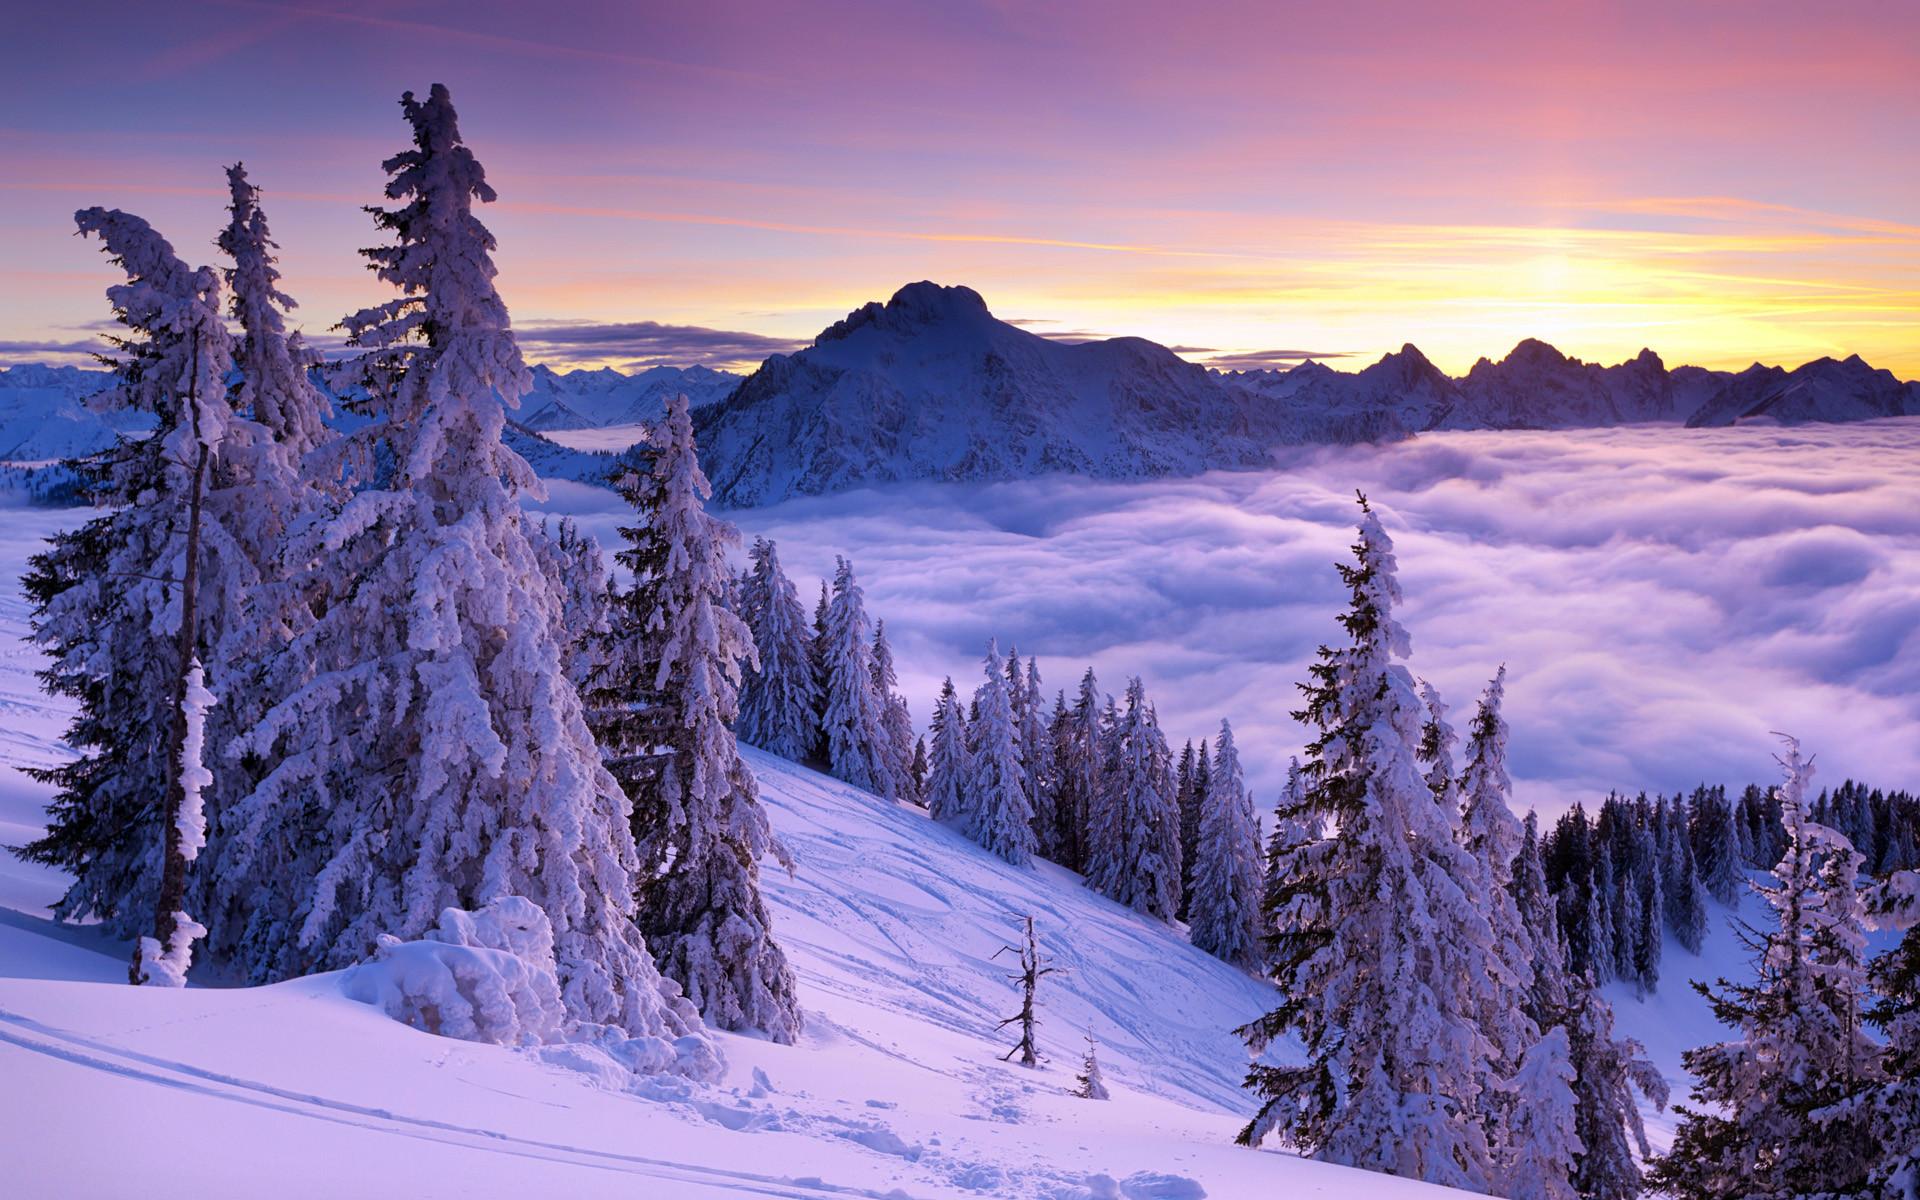 Purple Winter Sunset Wallpapers | HD Wallpapers